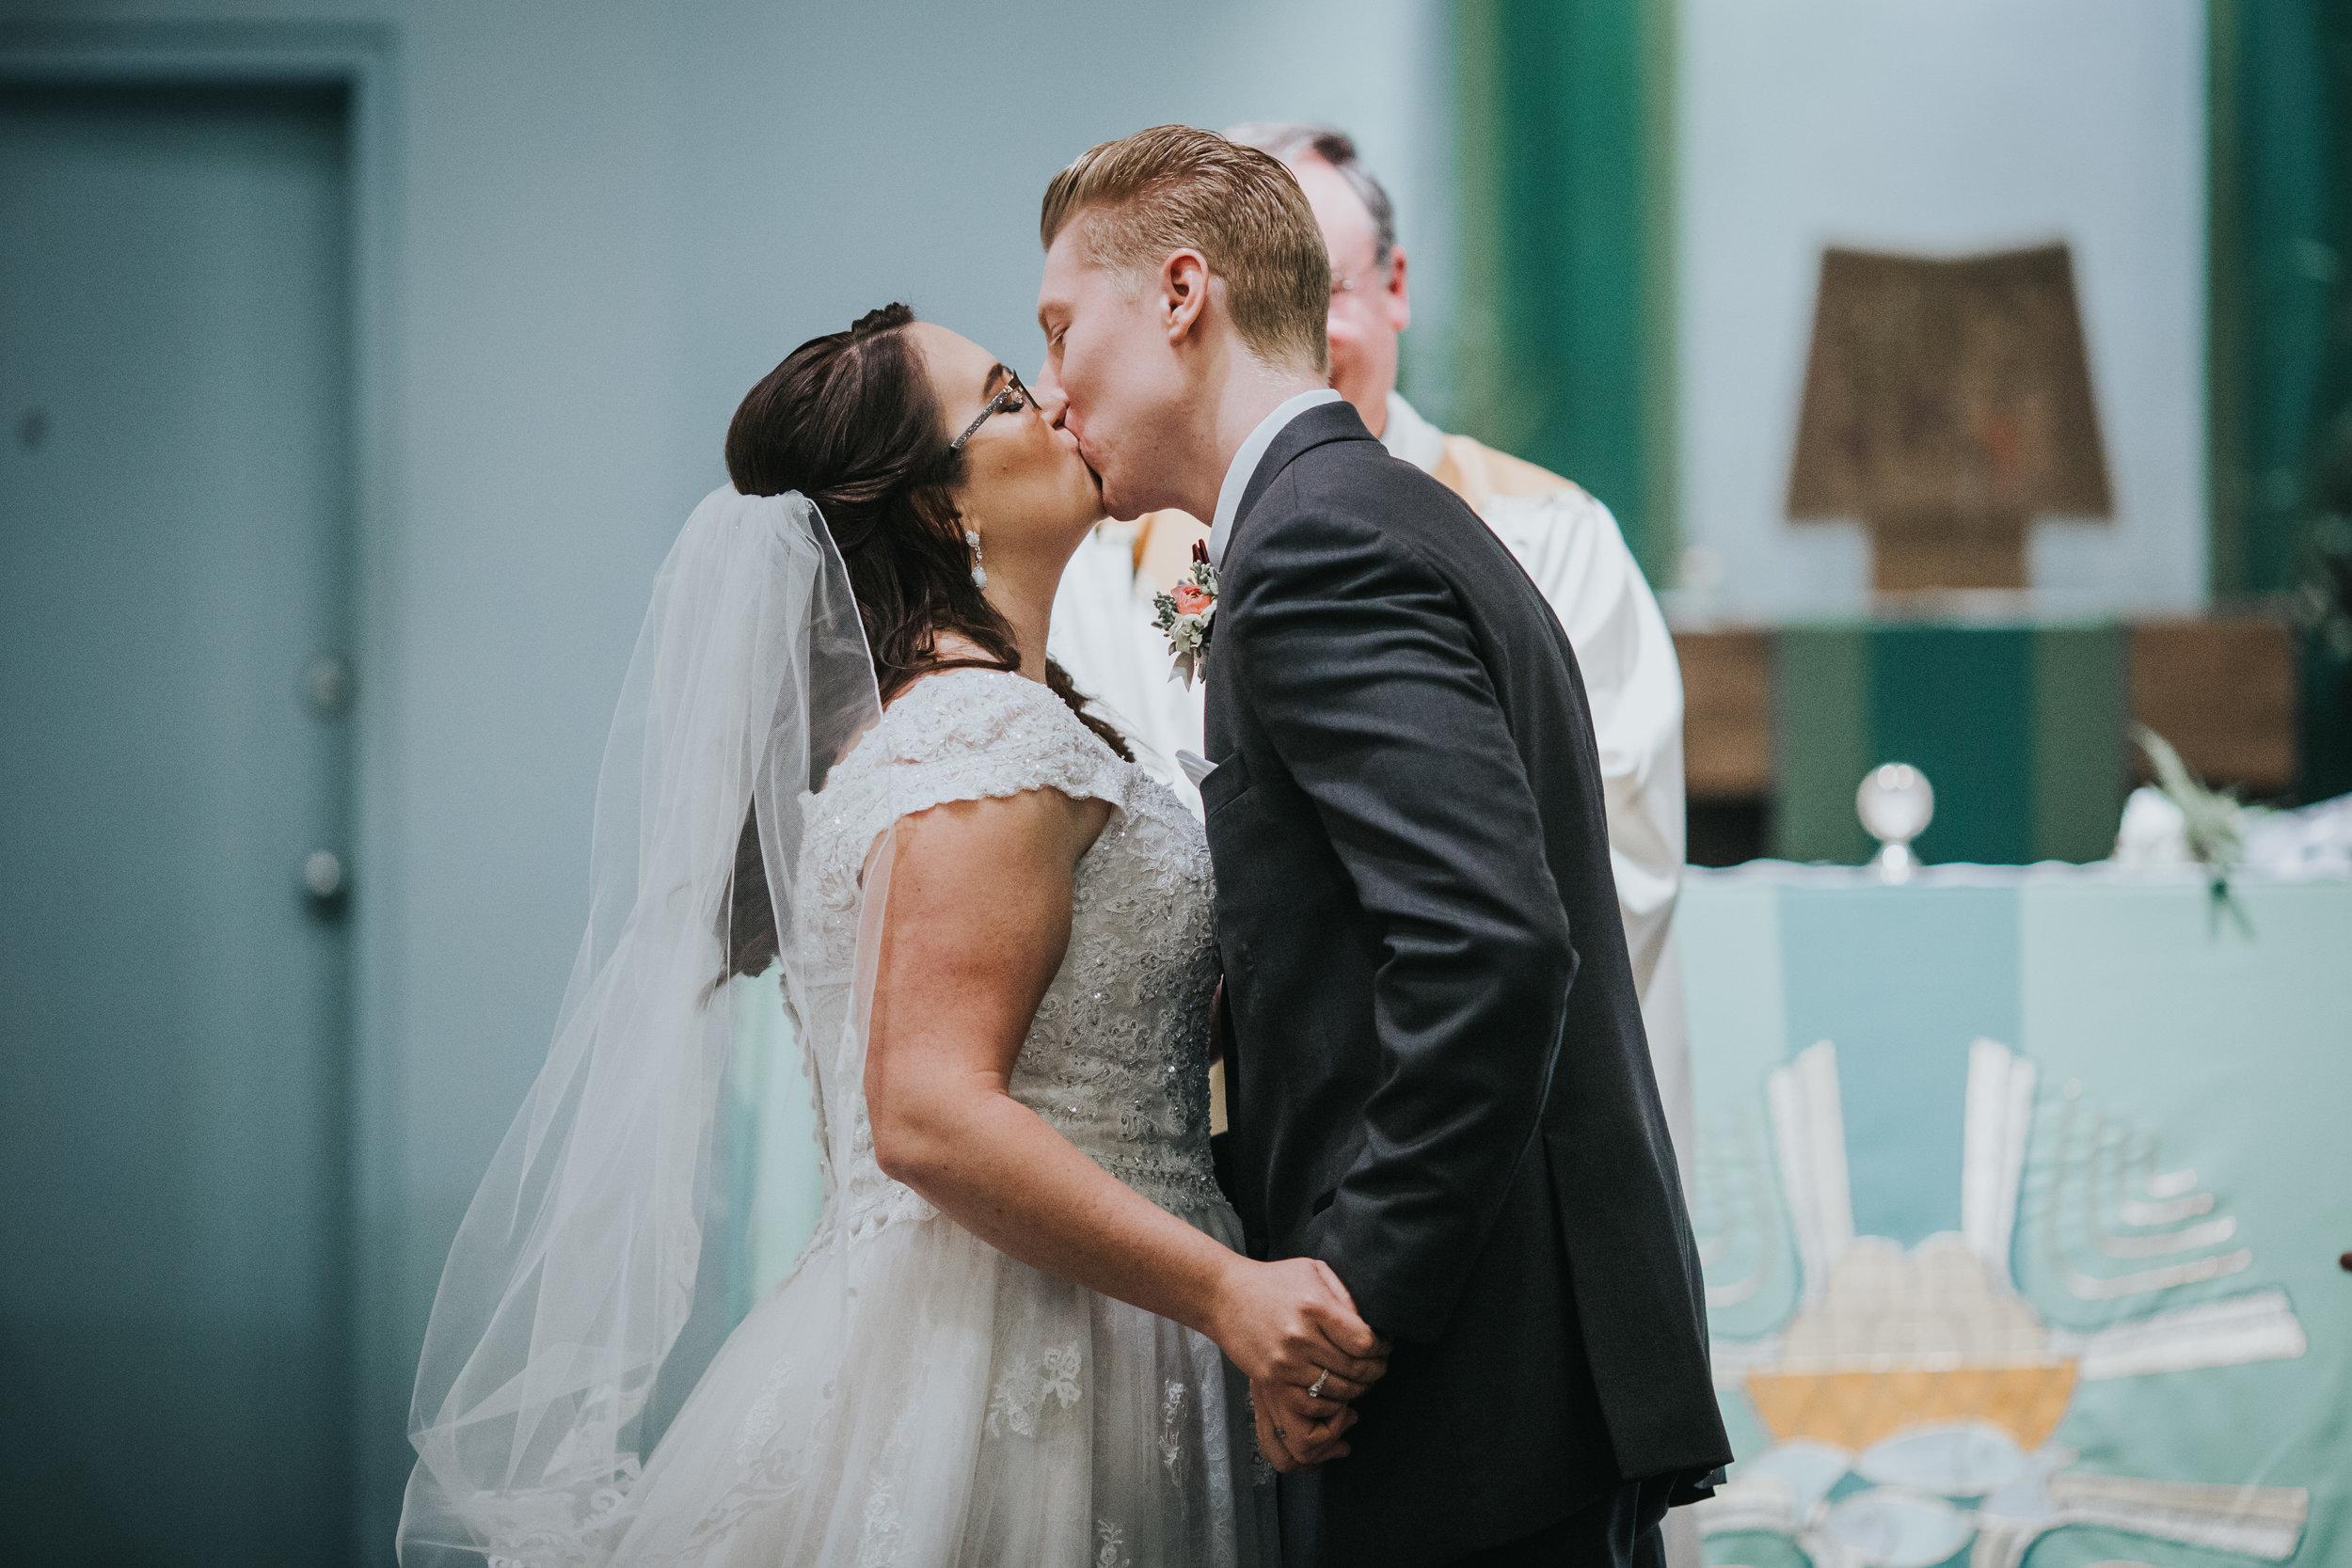 New-Jersey-Wedding-Photography-Fishers-Tudor-House-JennaLynnPhotography-Ceremony-Kathleen&Eddie-41.jpg